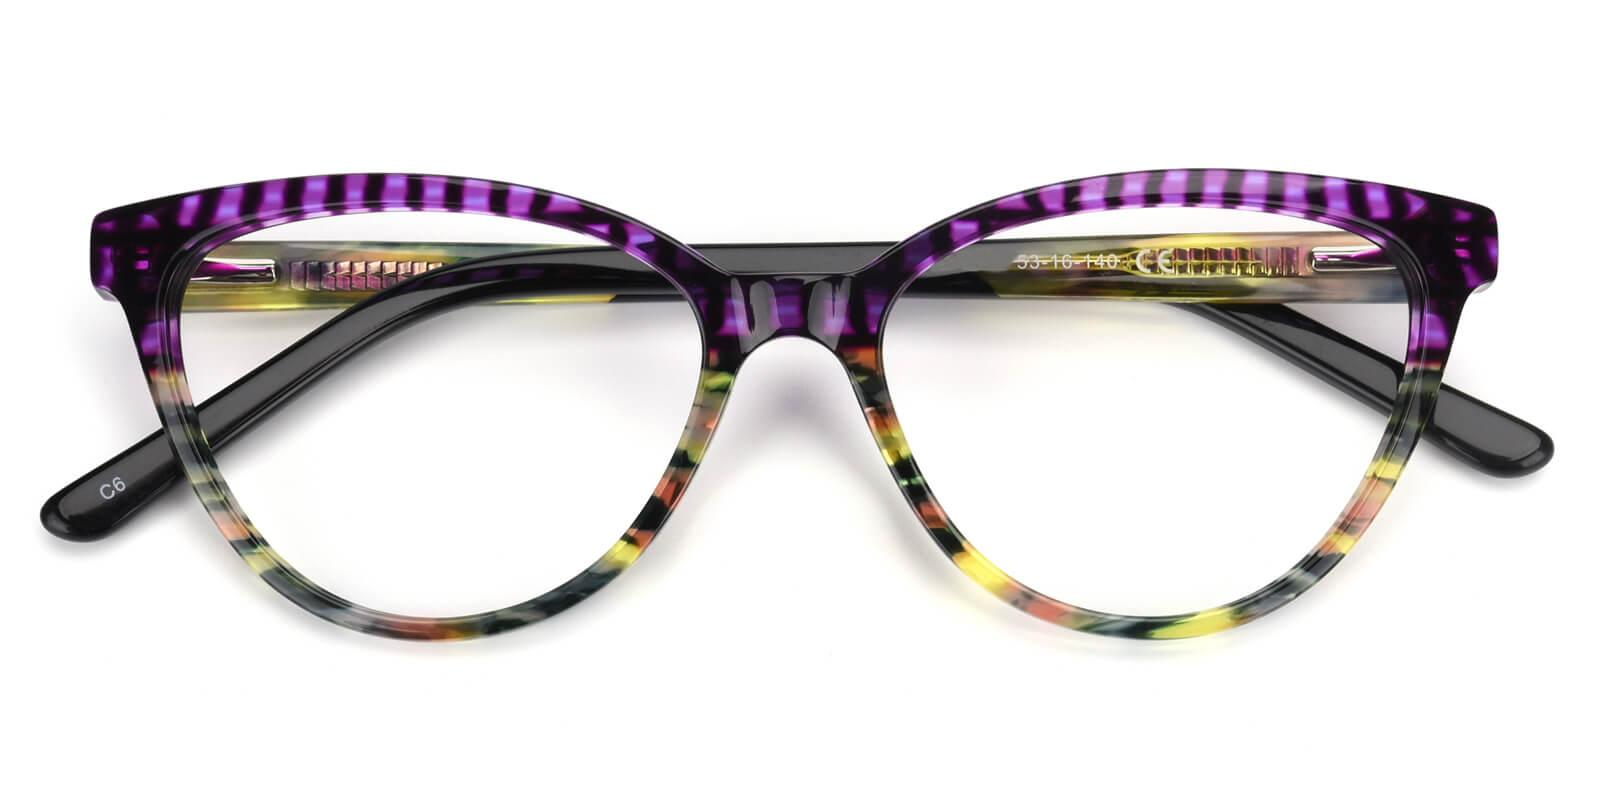 Daphnely-Purple-Cat-Acetate-Eyeglasses-detail